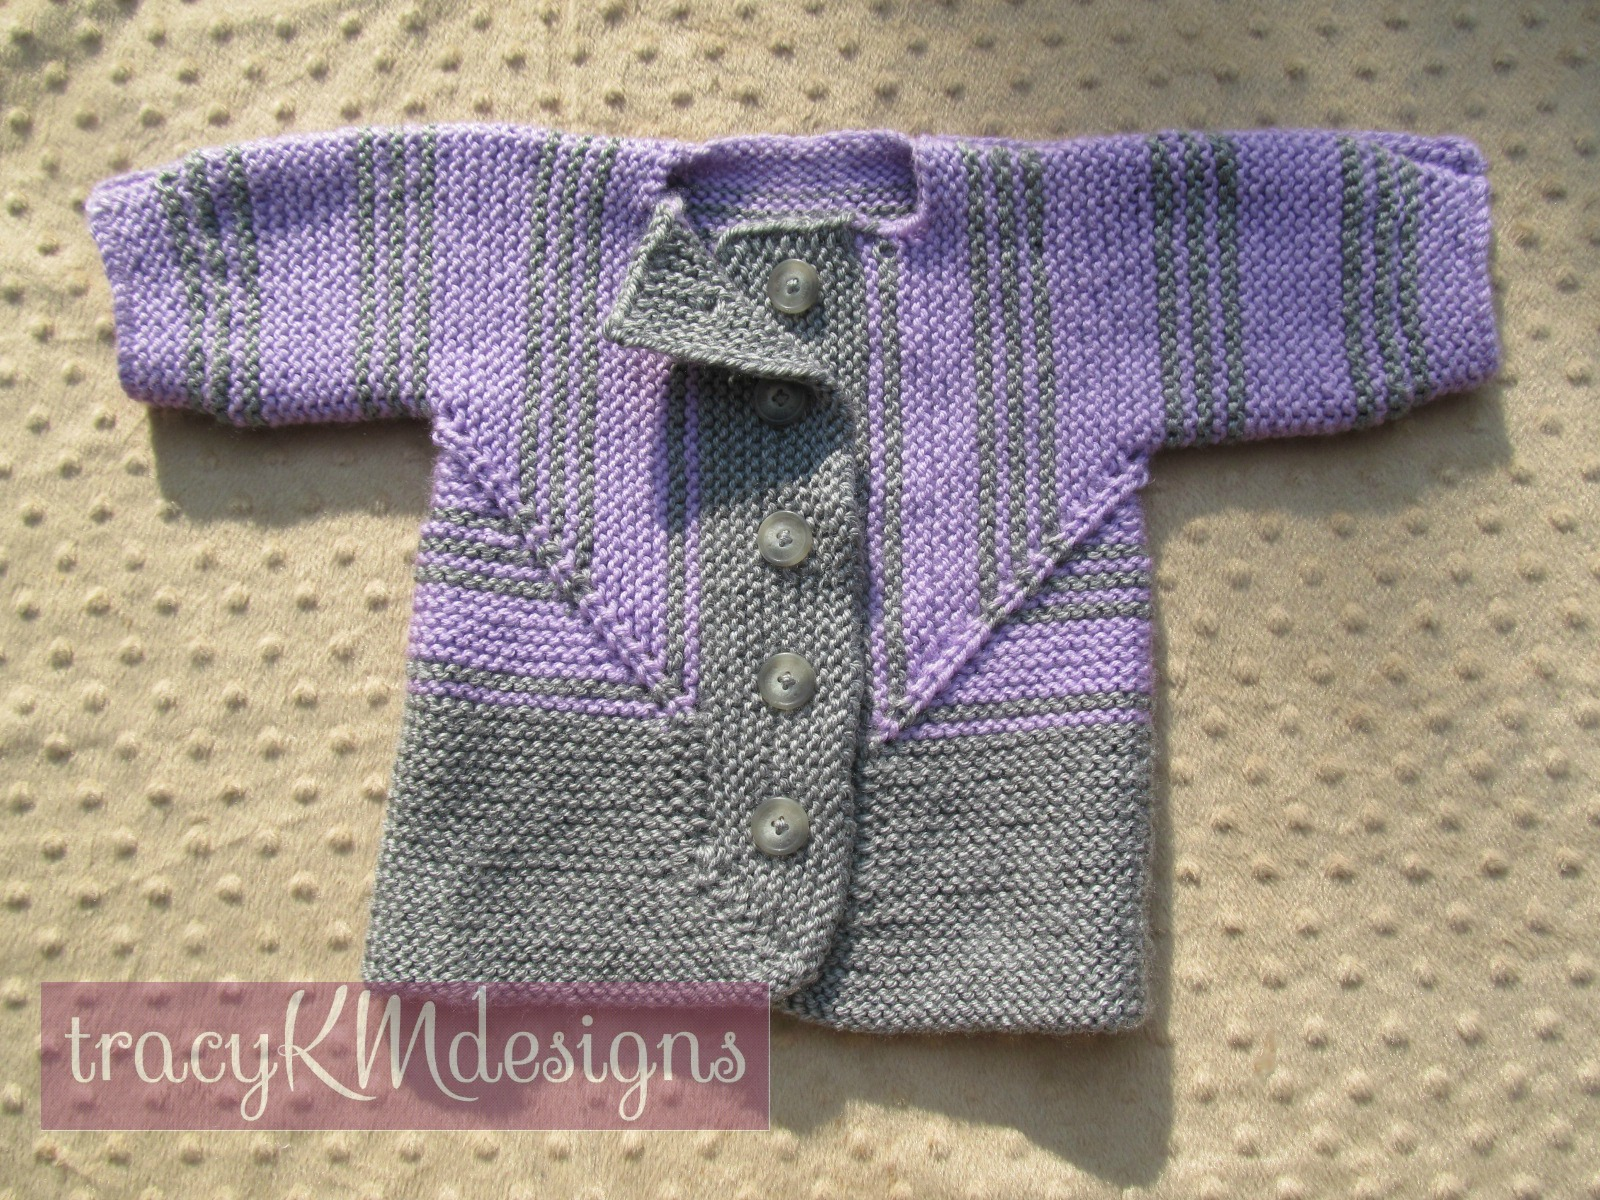 Knitting Knotty : Knotty knits and naughty kids still knitting